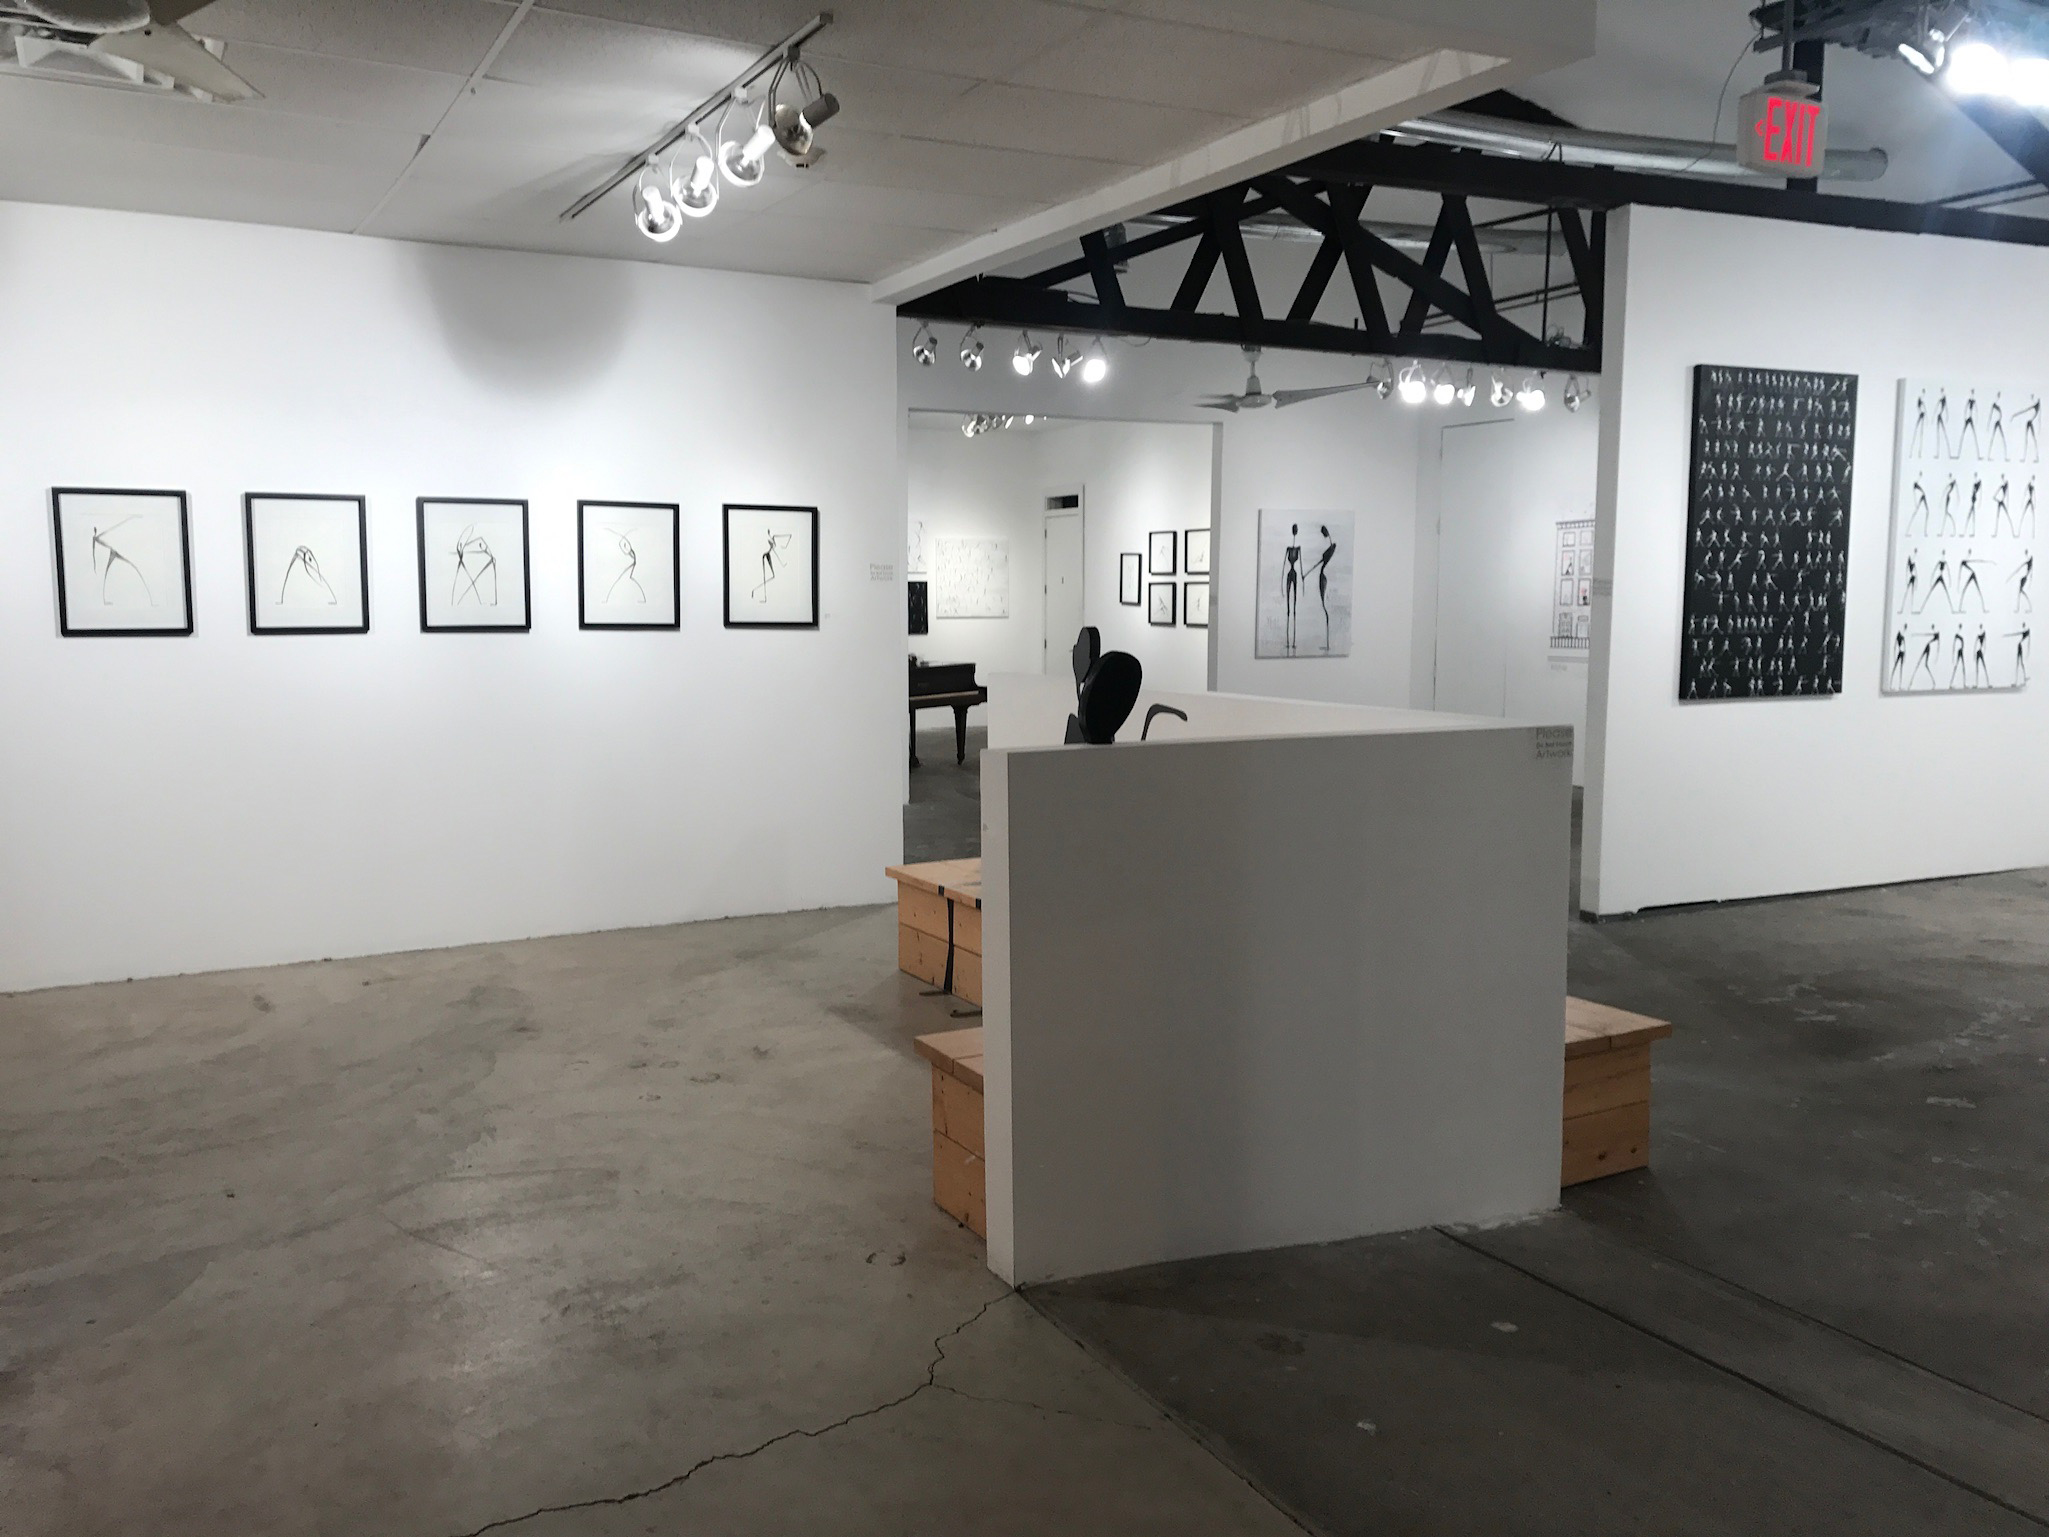 Kinaesthetics+gallery+2018j.jpg